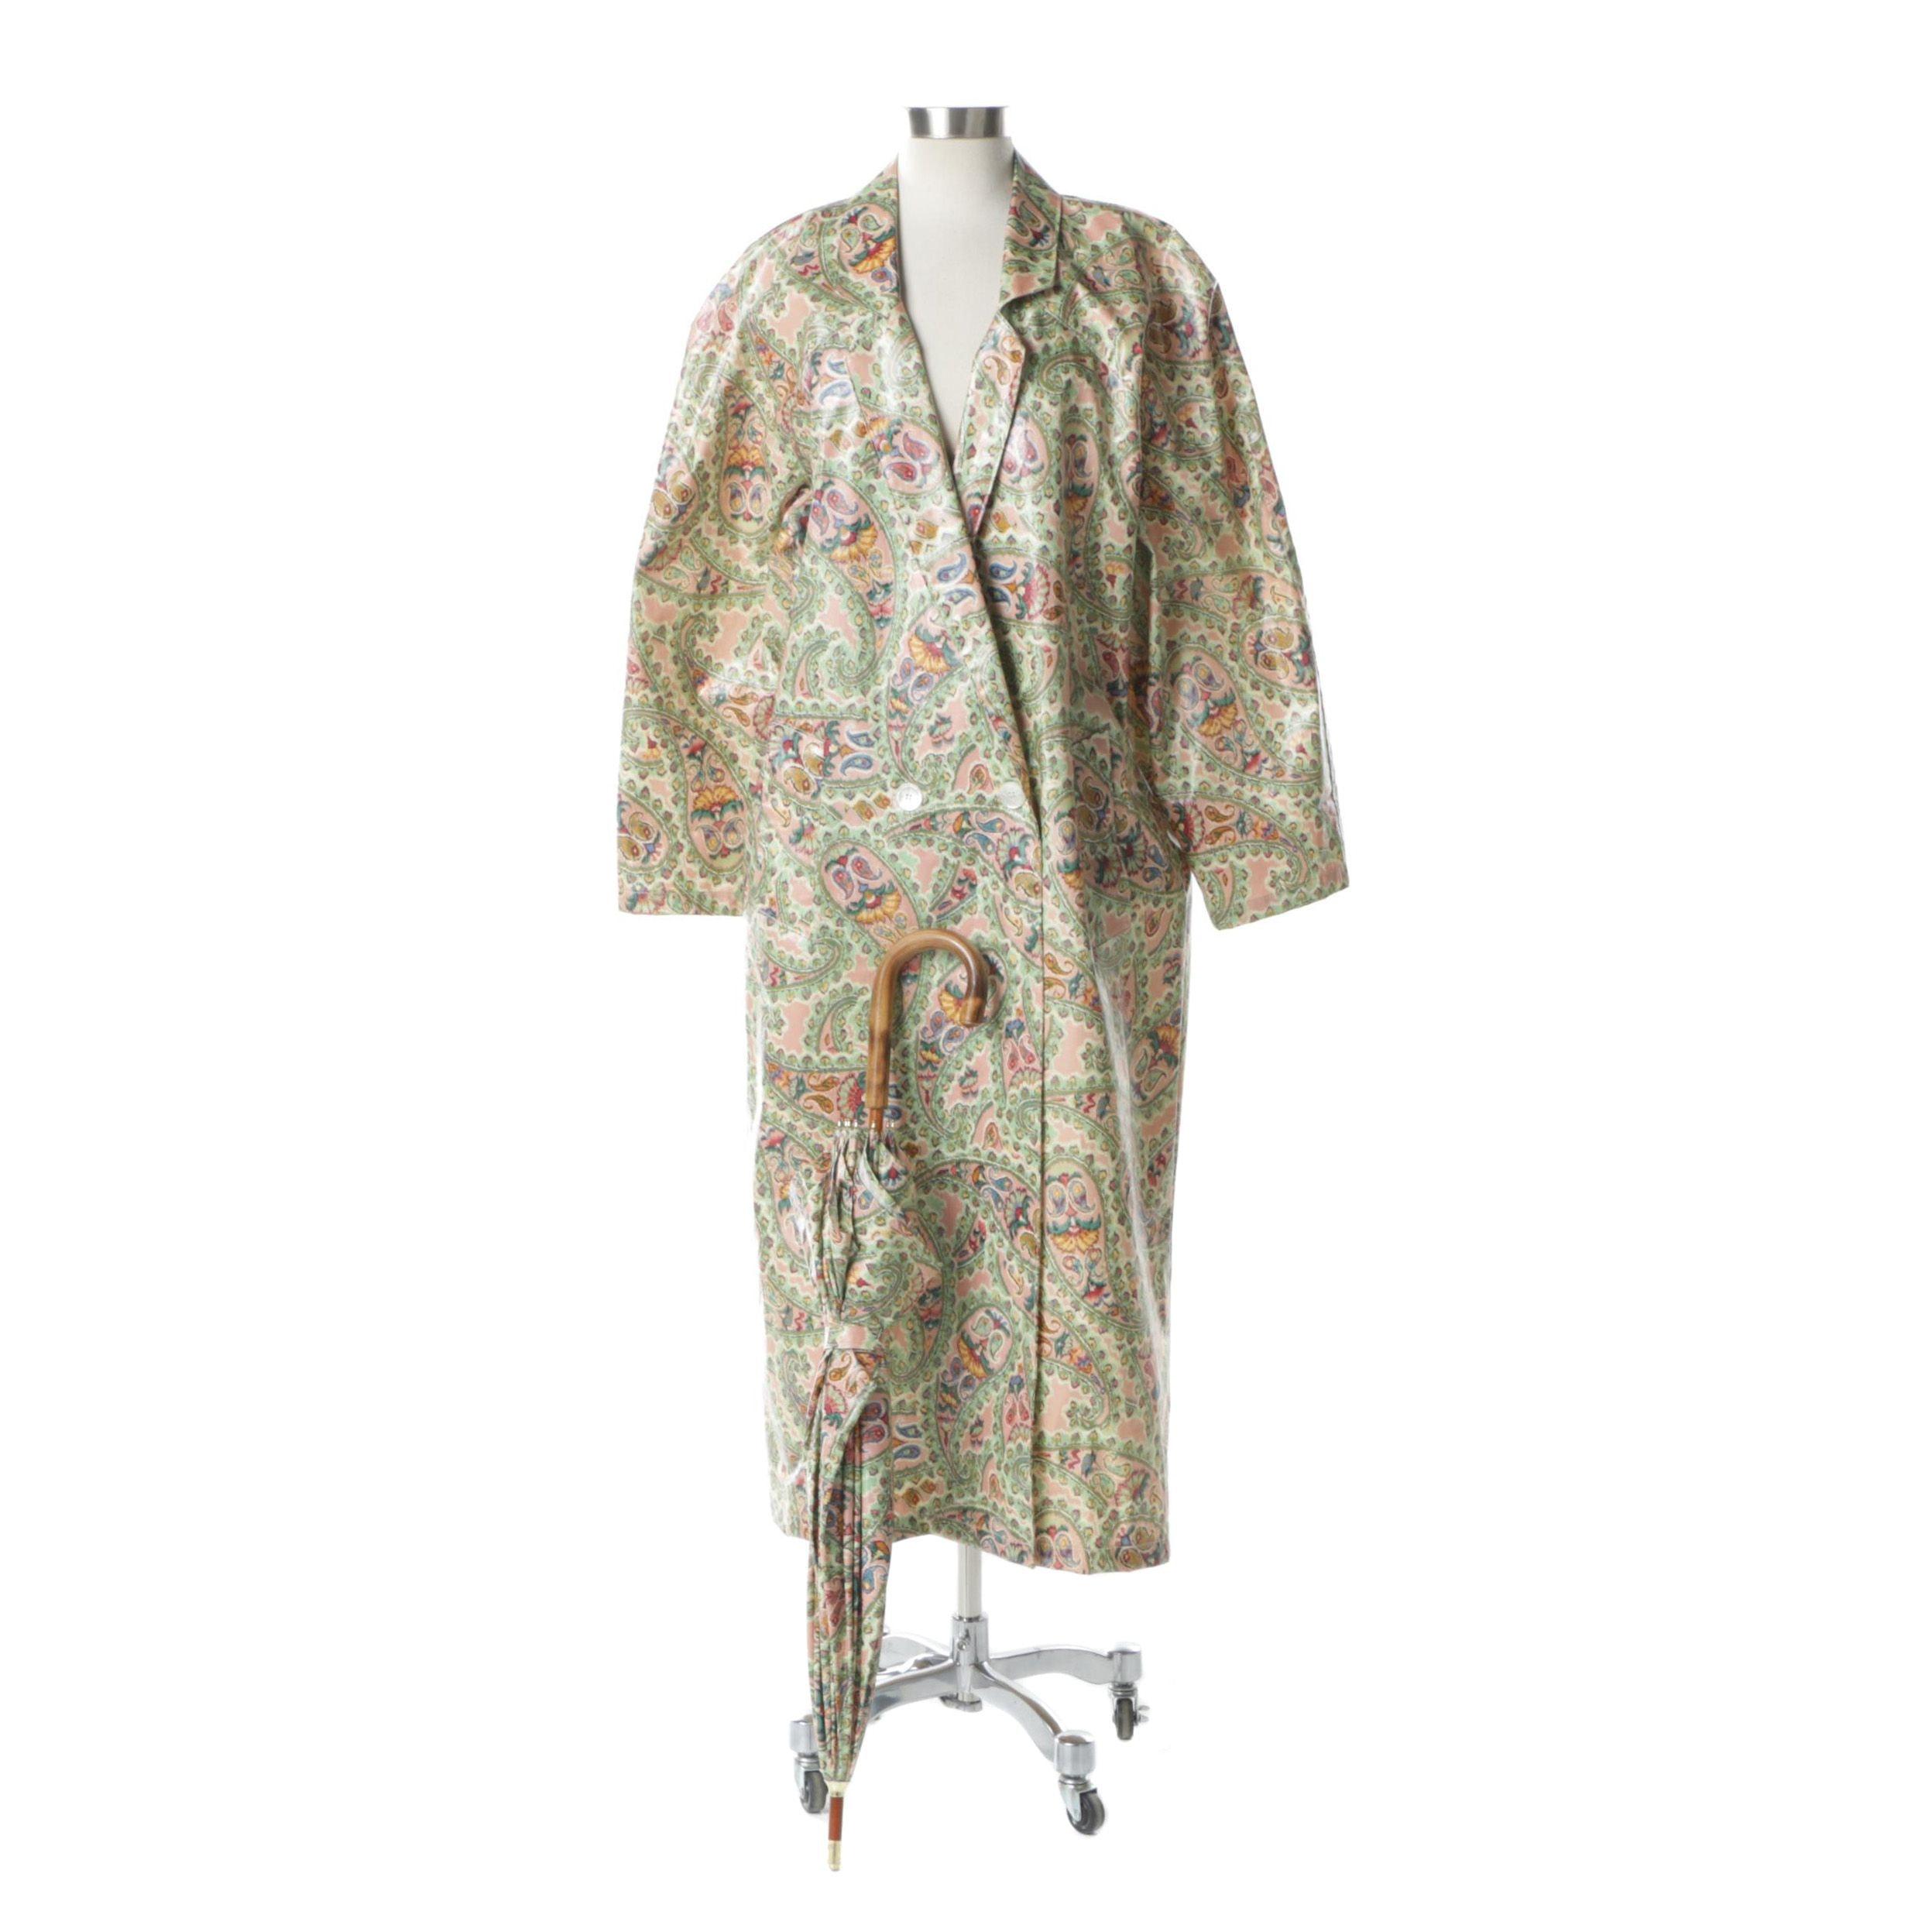 Women's Nordic House Designs Floral Paisley Raincoat and Umbrella